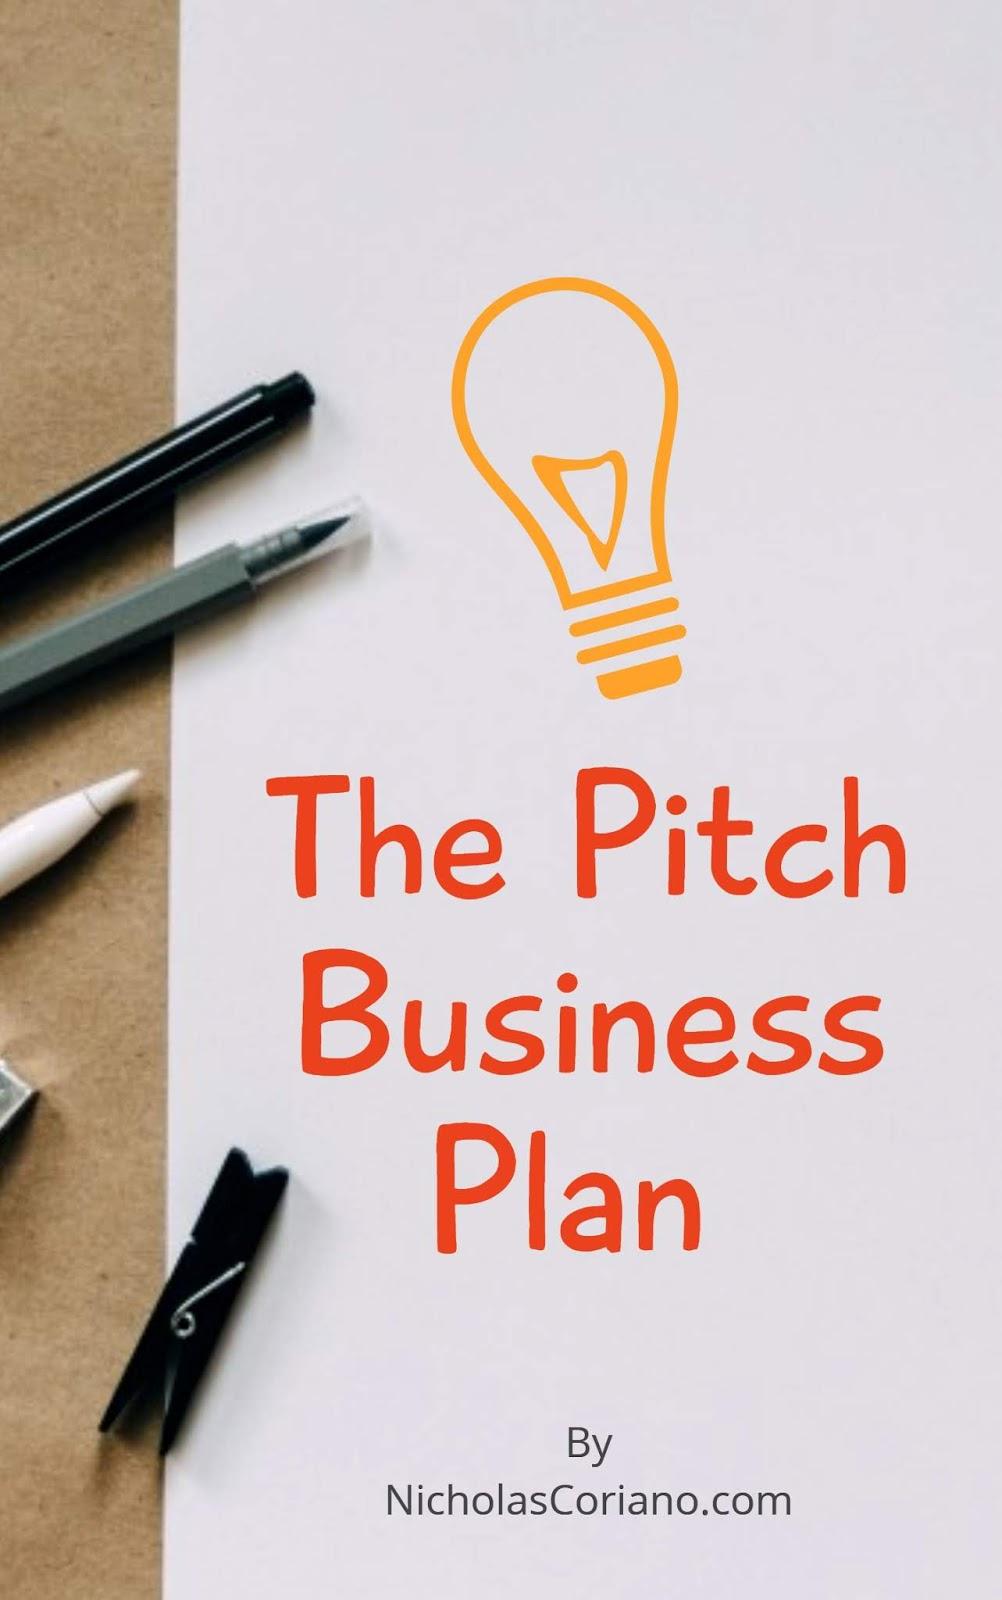 nicholas g coriano standard business plans